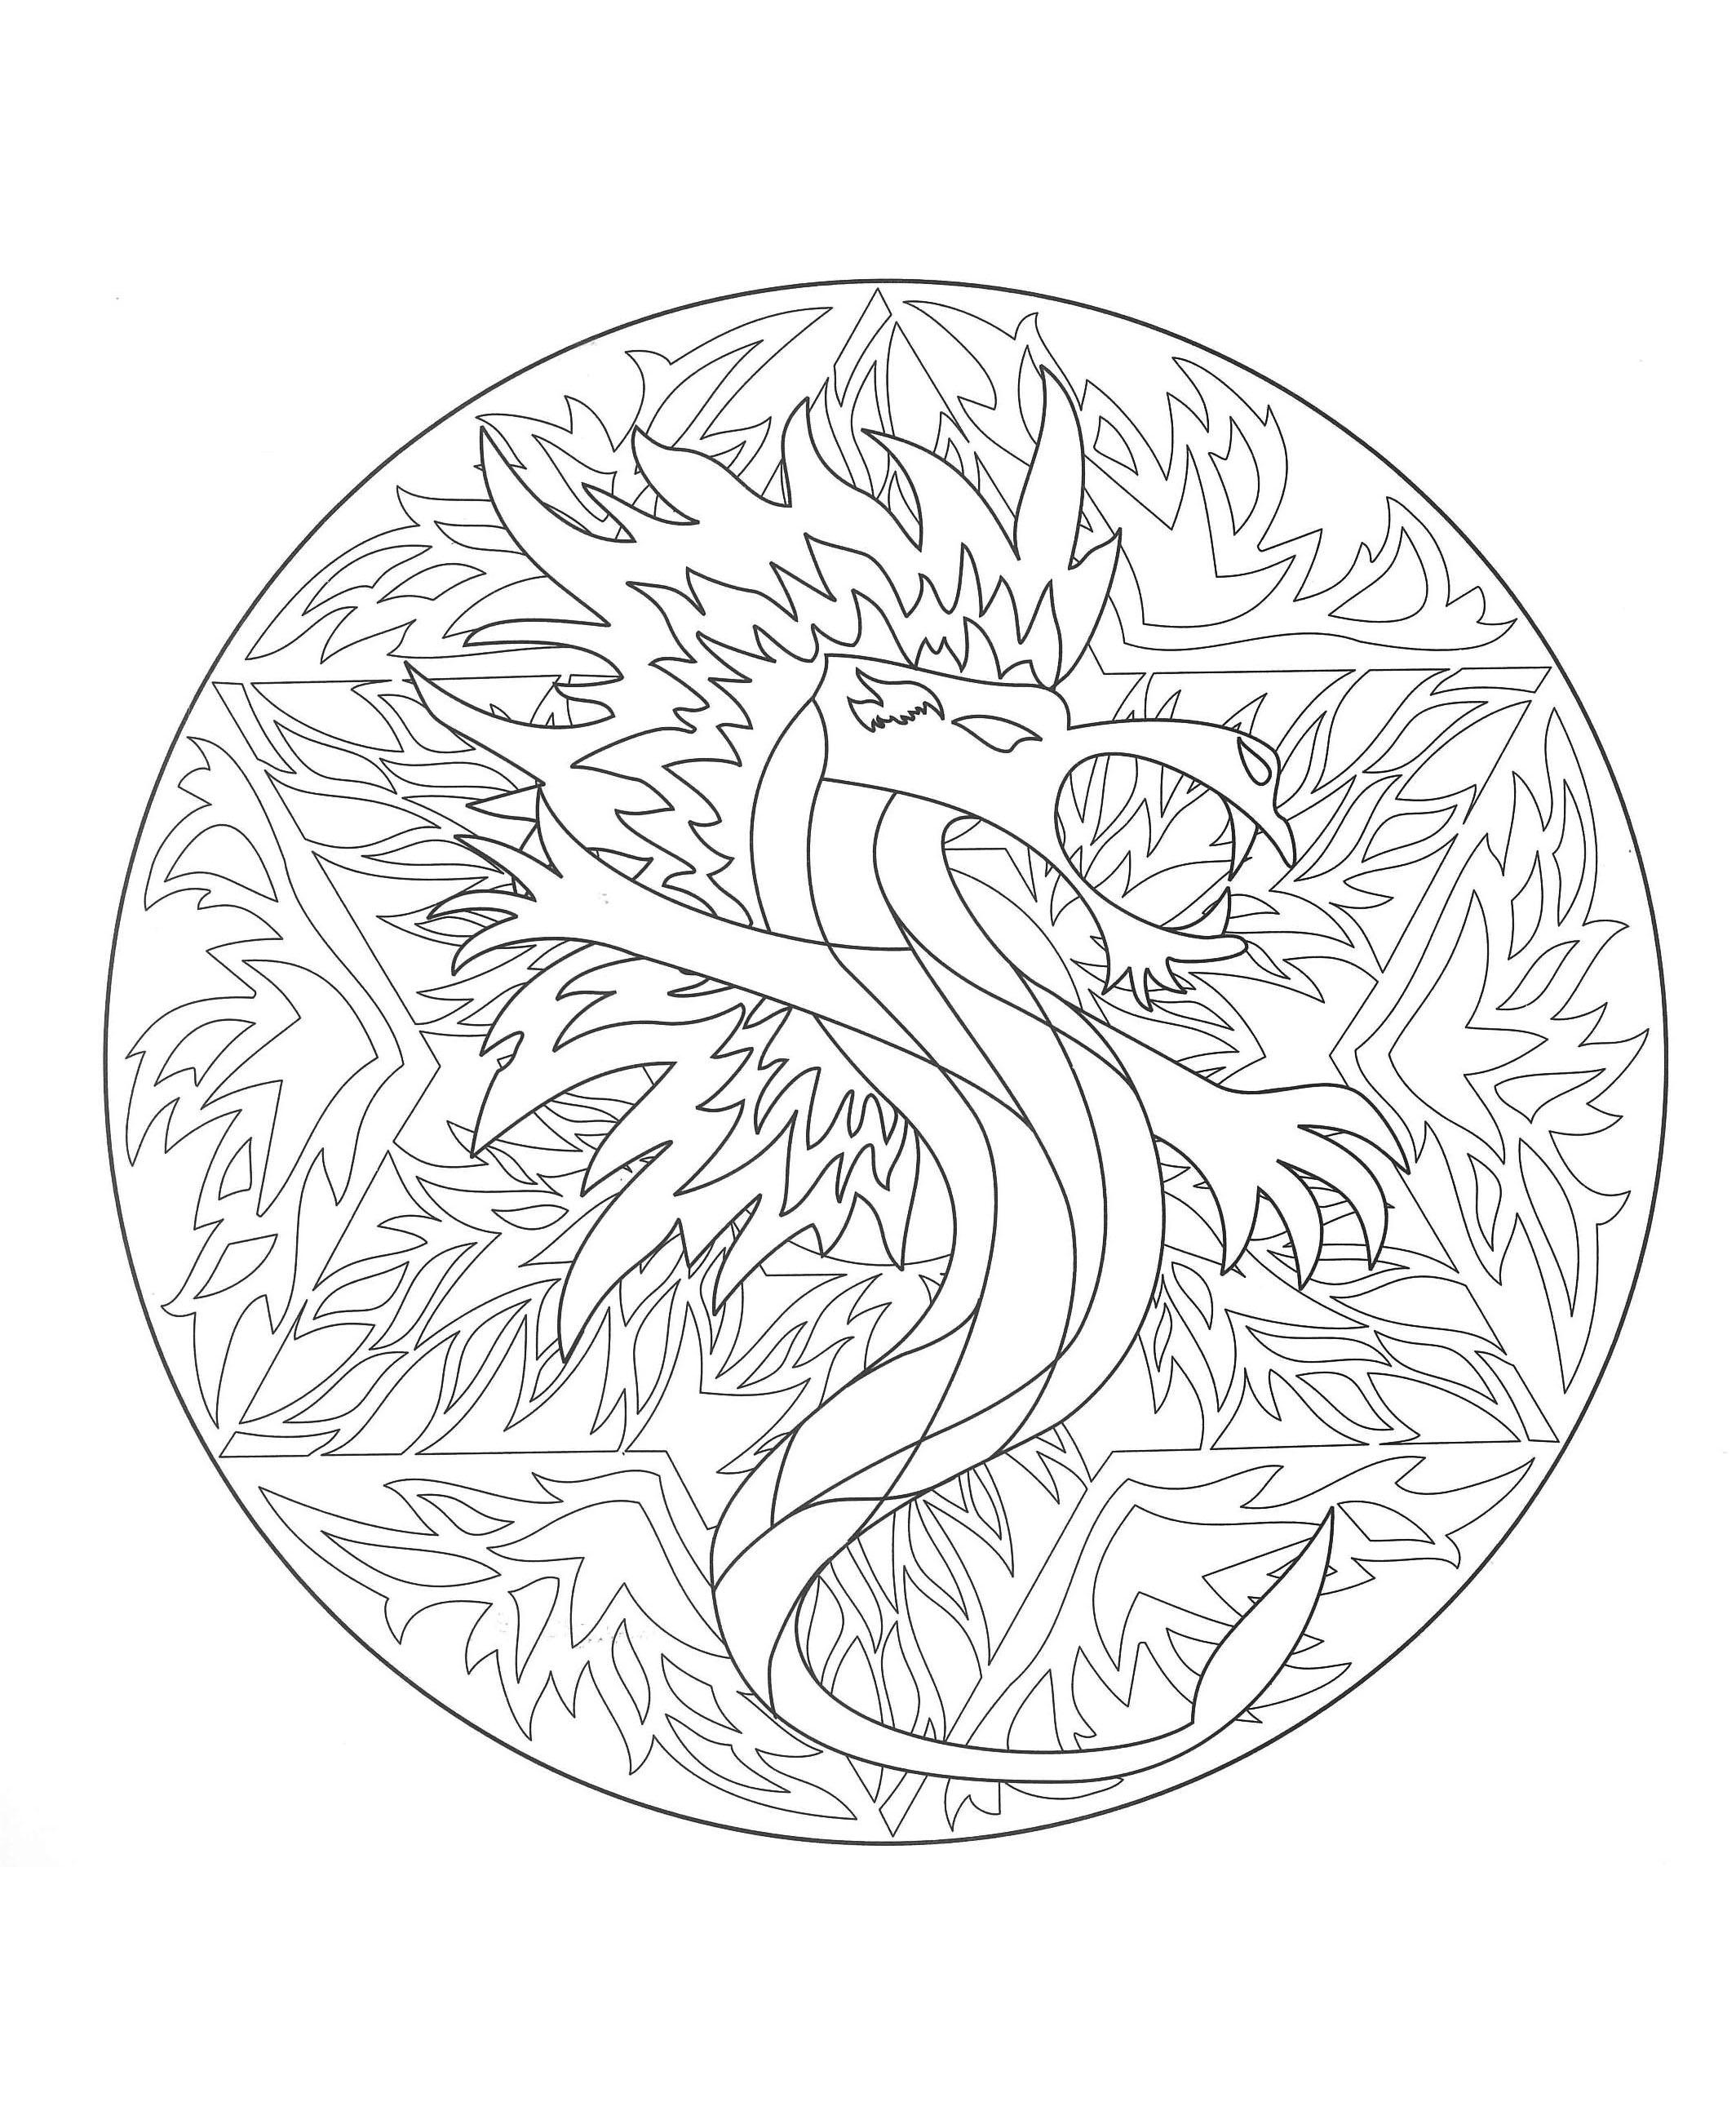 Joli Mandala Dragon Mandalas Difficiles Pour Adultes 100 Mandalas Zen Anti Stress